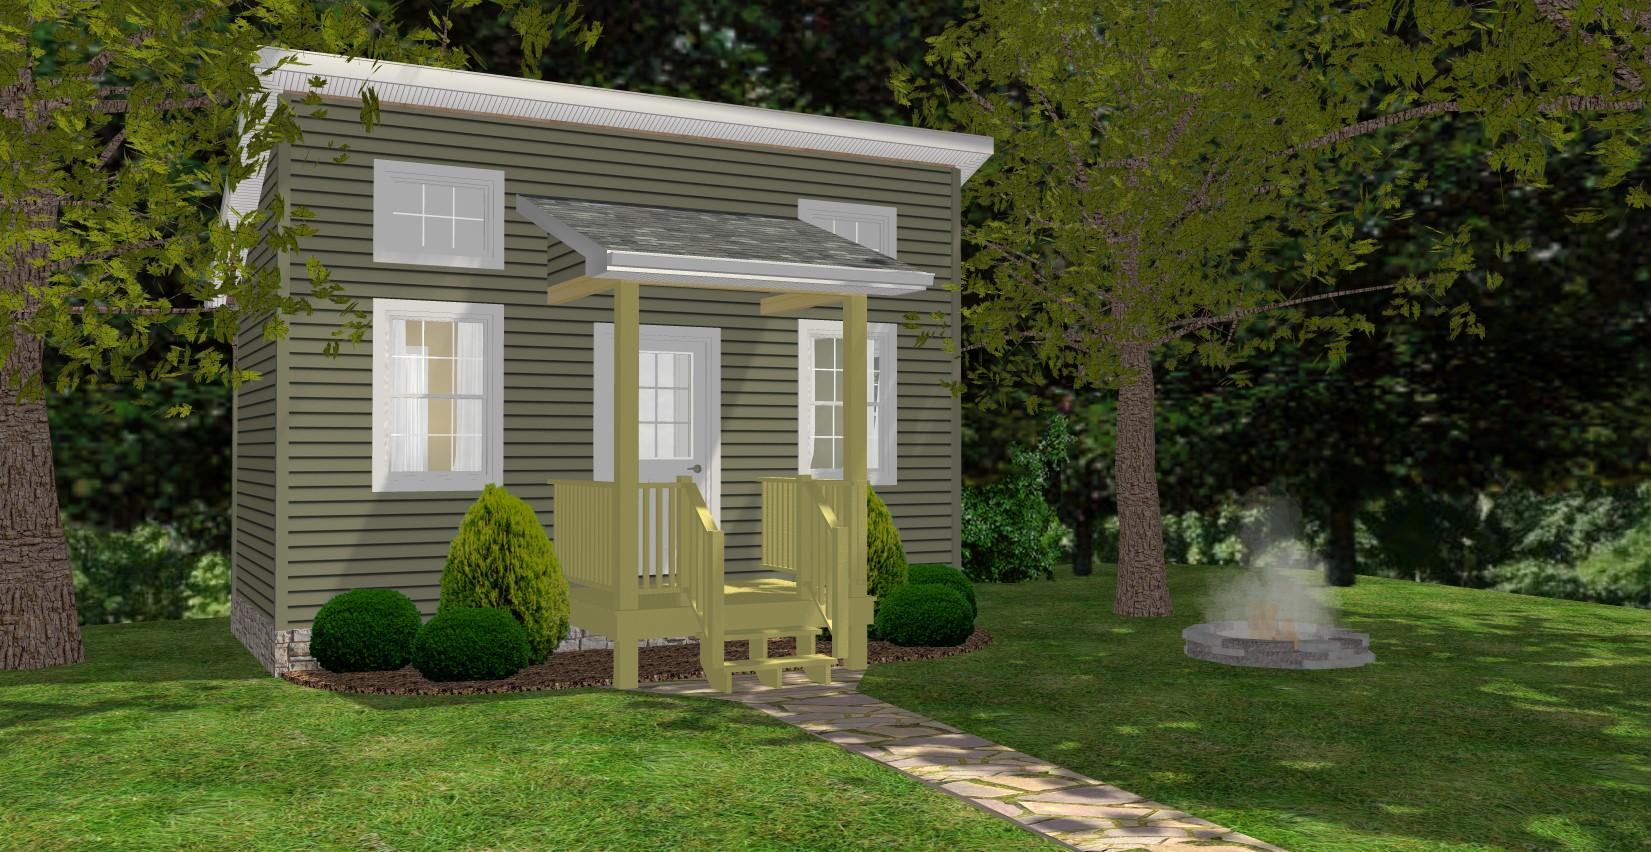 Tiny House Designs - The Bachelor on tiny house sketch up, tiny house fad, tiny house blueprints, tiny house 3d model,